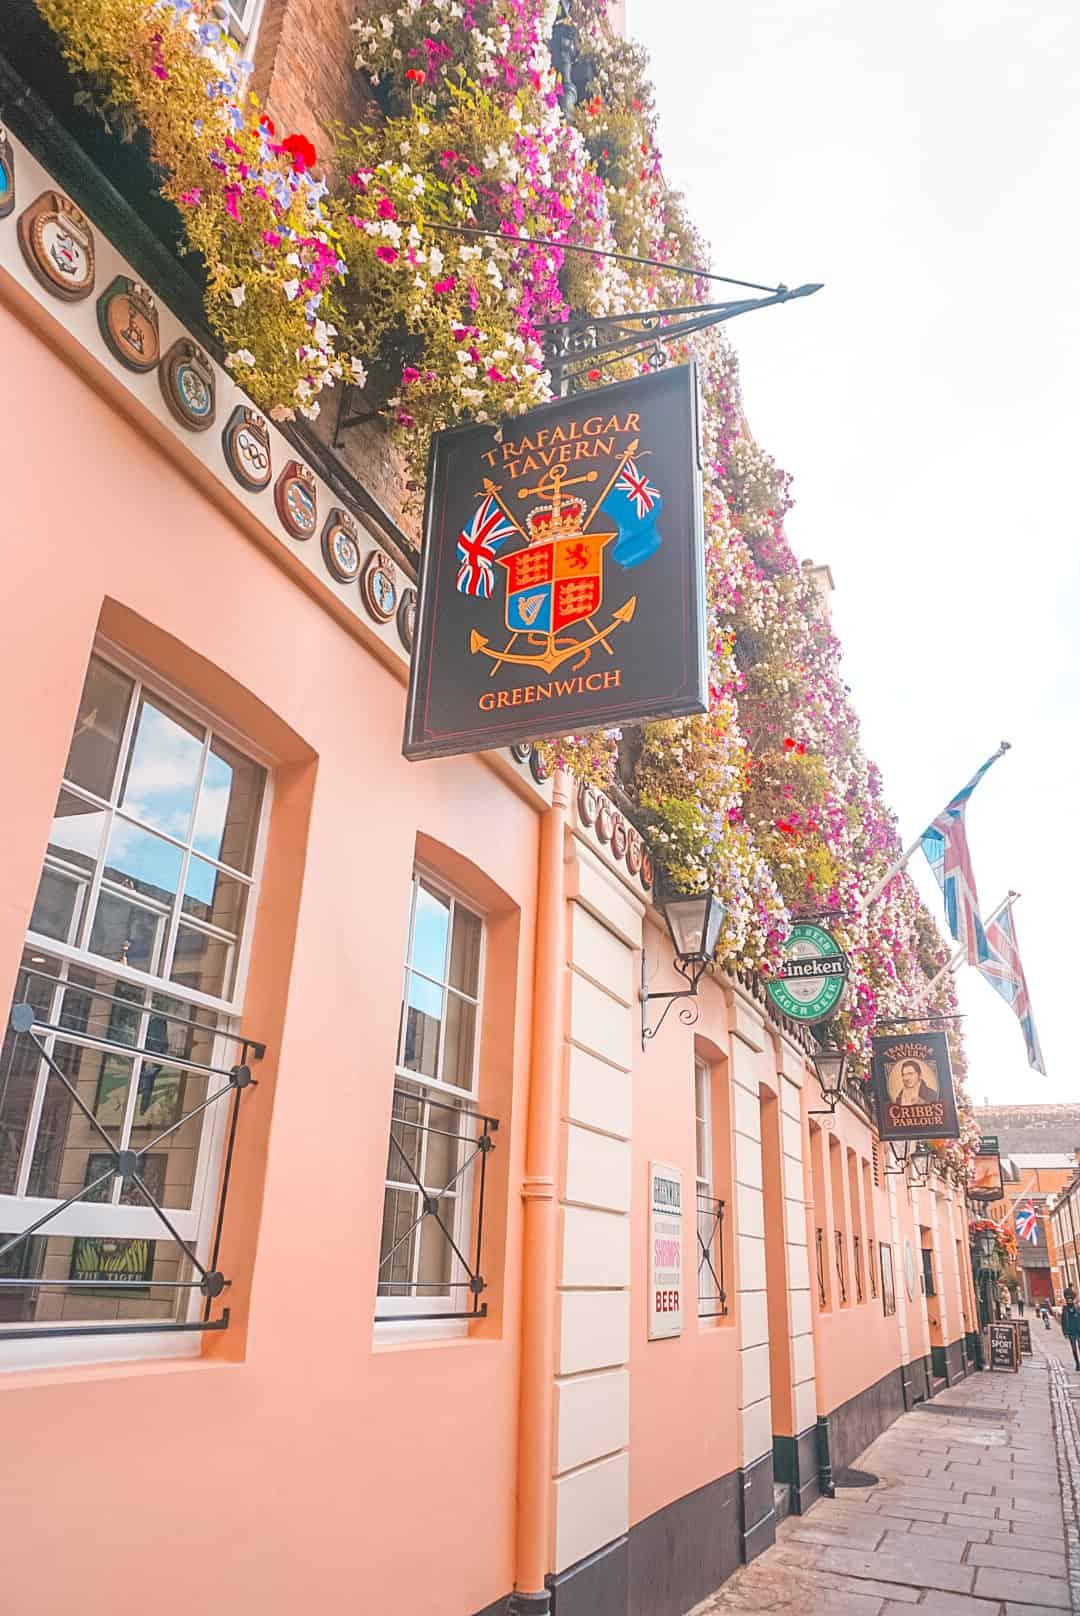 Trafalgar Tavern London